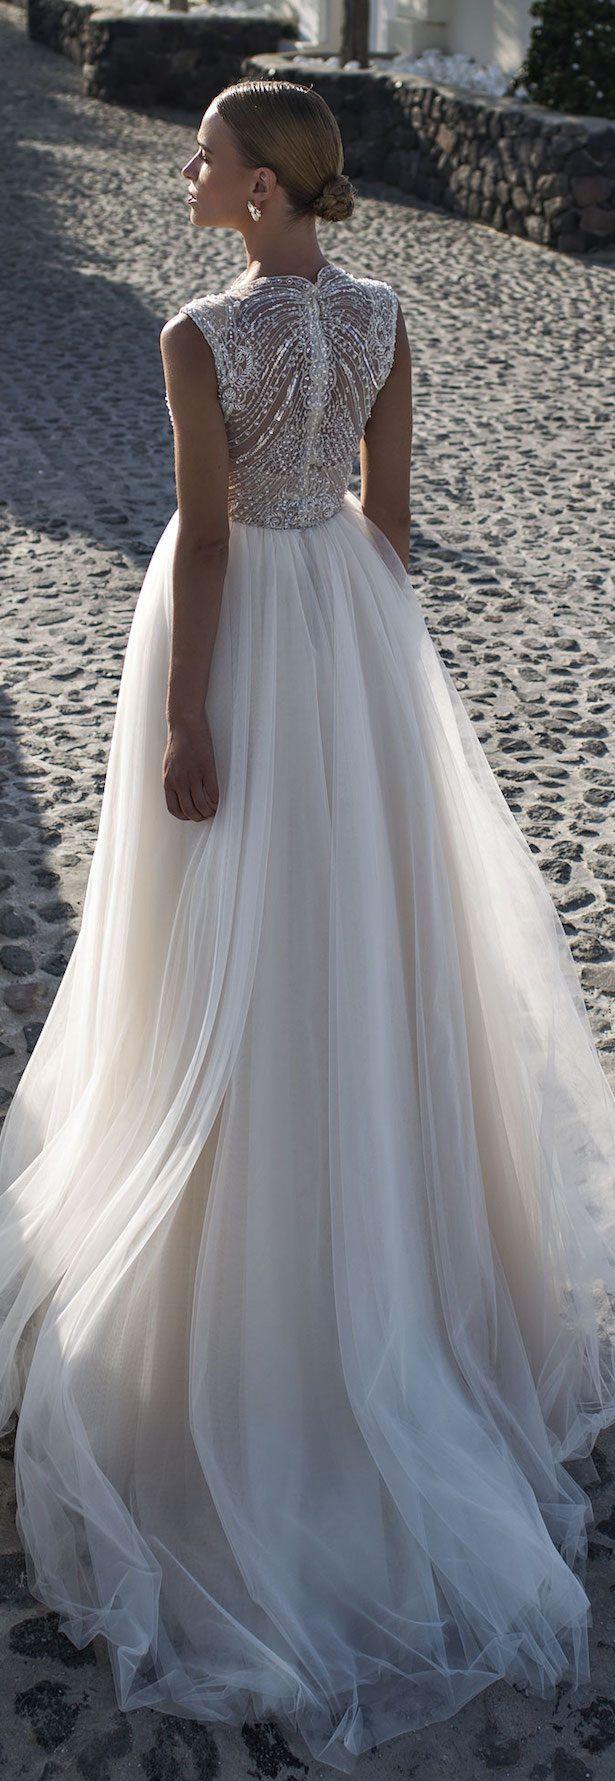 Best Wedding Dresses of 2016 - Julie Vino 2016 - Santorini Collection